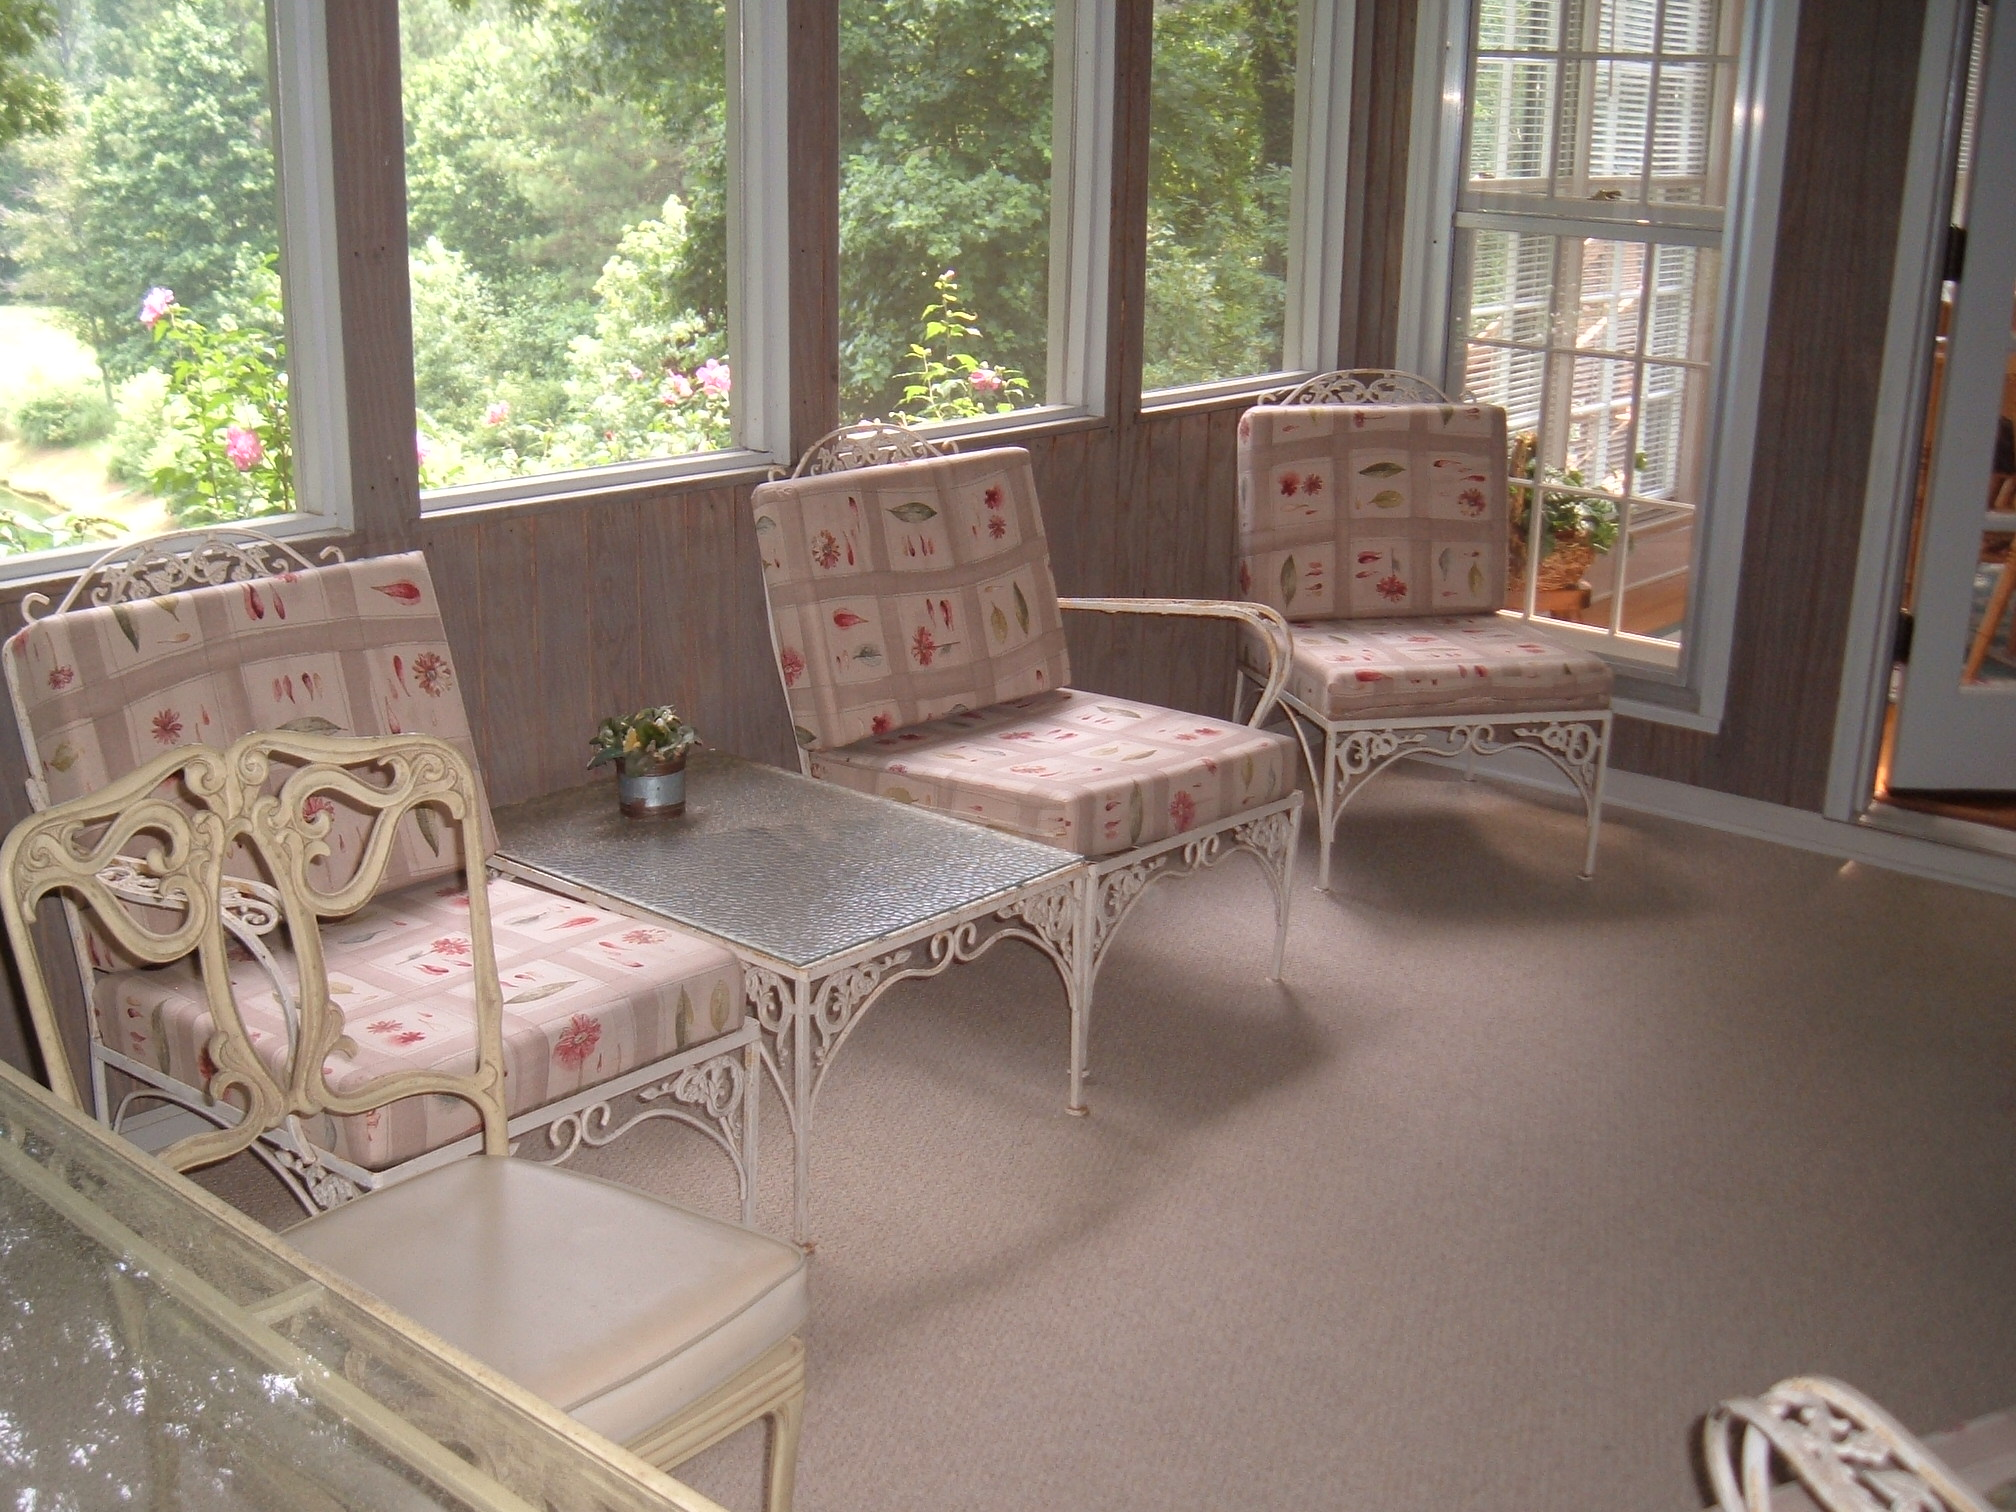 Vintage patio furniture sets - Wrought Iron Patio Furniture Atlanta Ga 21043054 Ongek Net Vintage Metal Patio Chairs Amazing Furniture Sets